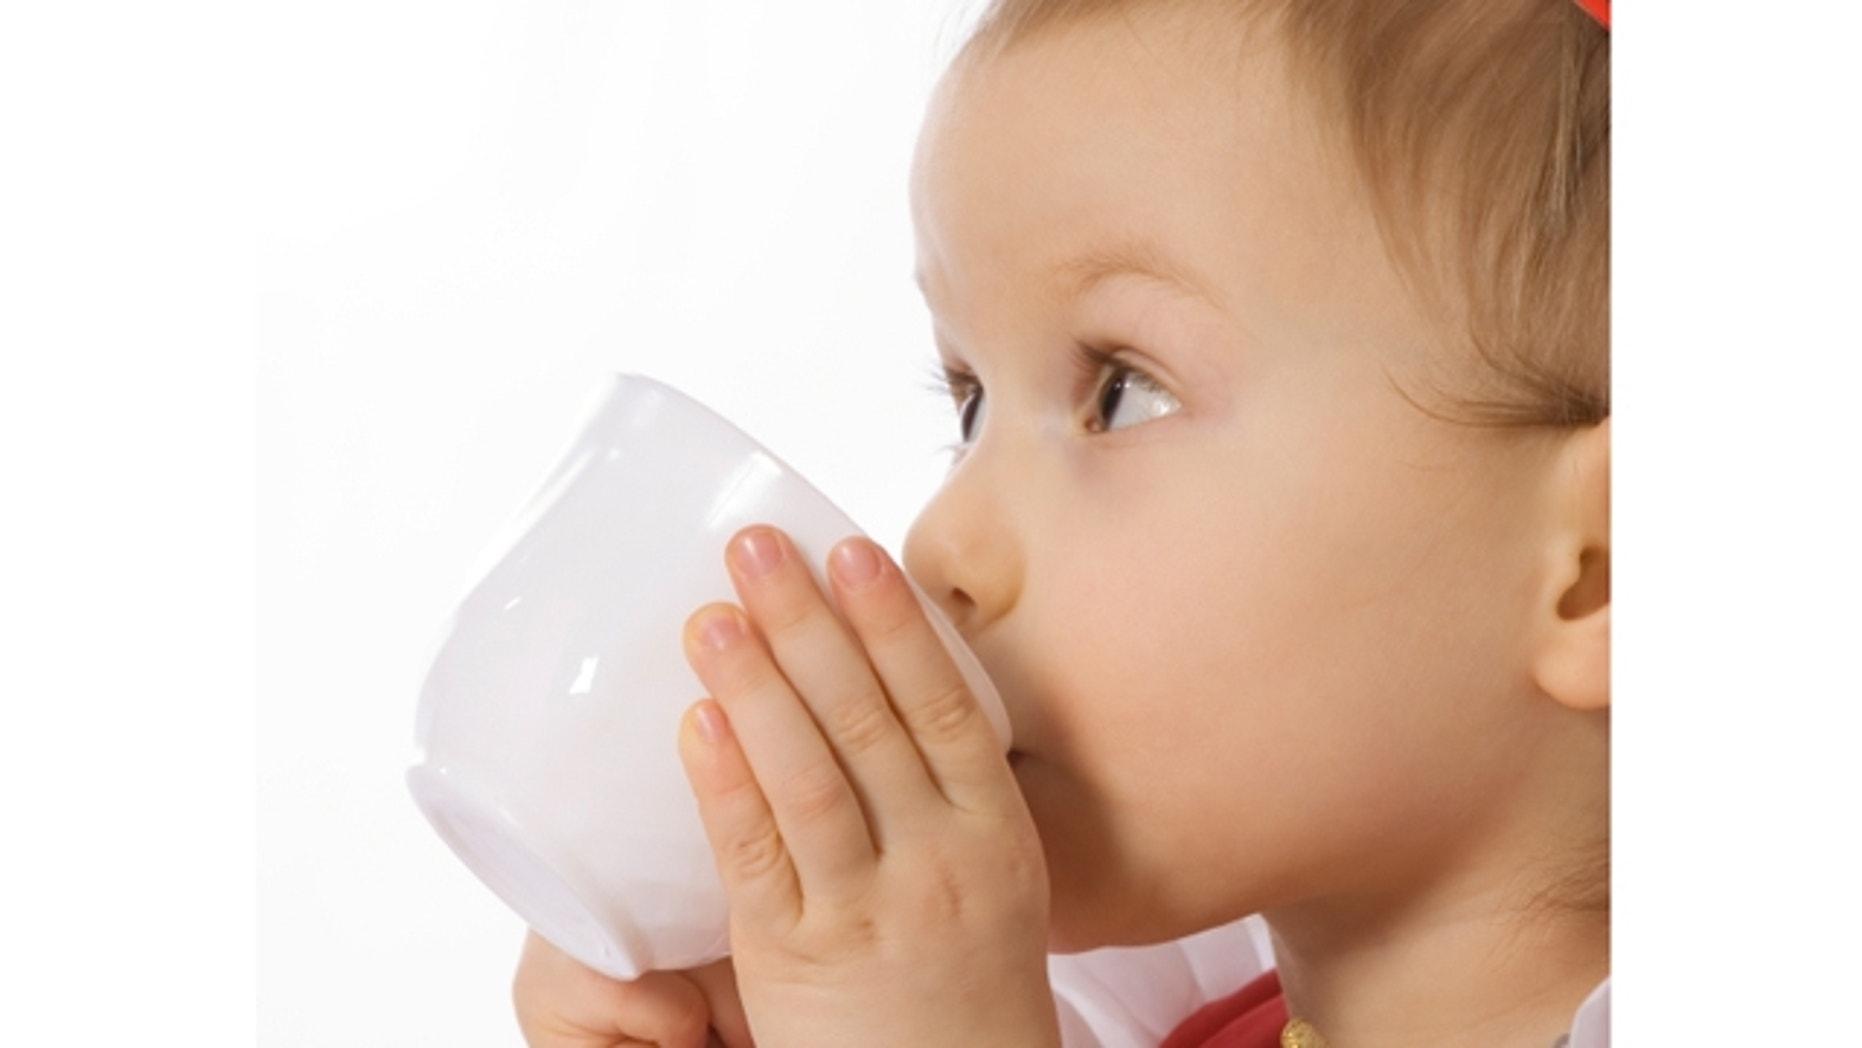 drinking baby